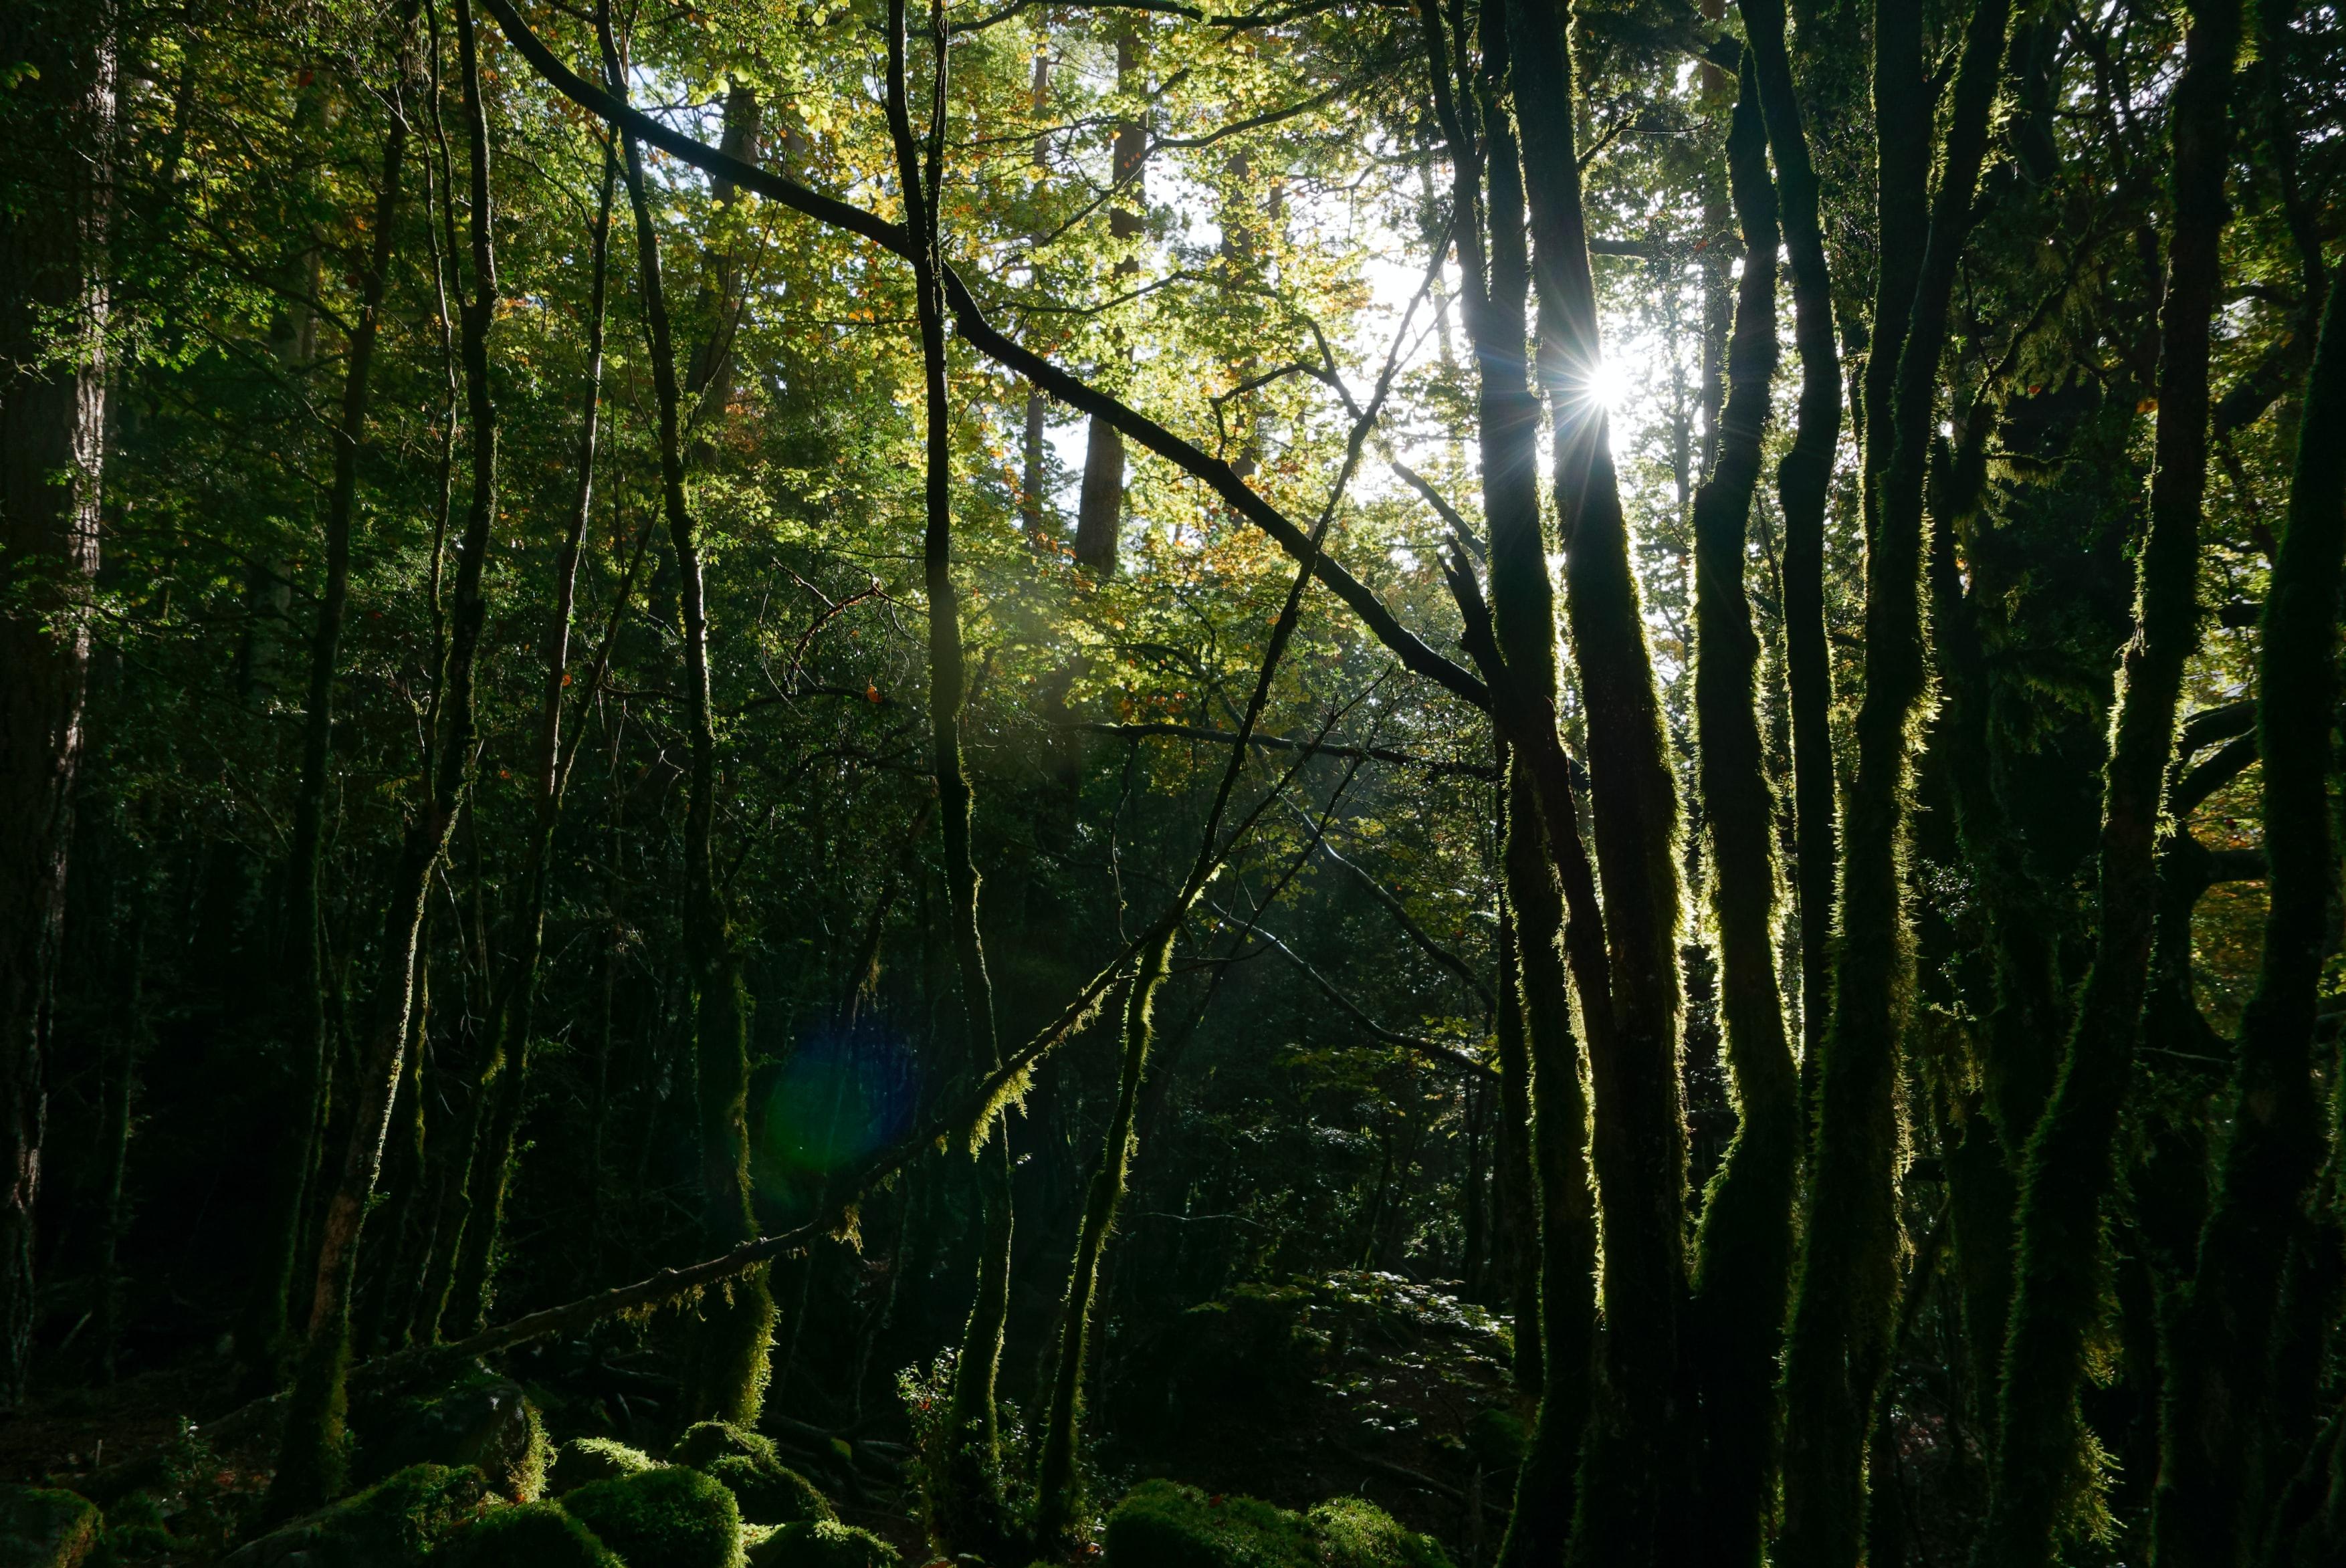 Ordesa Monte Perdido National Park, Spain, National Parks to Visit in Europe